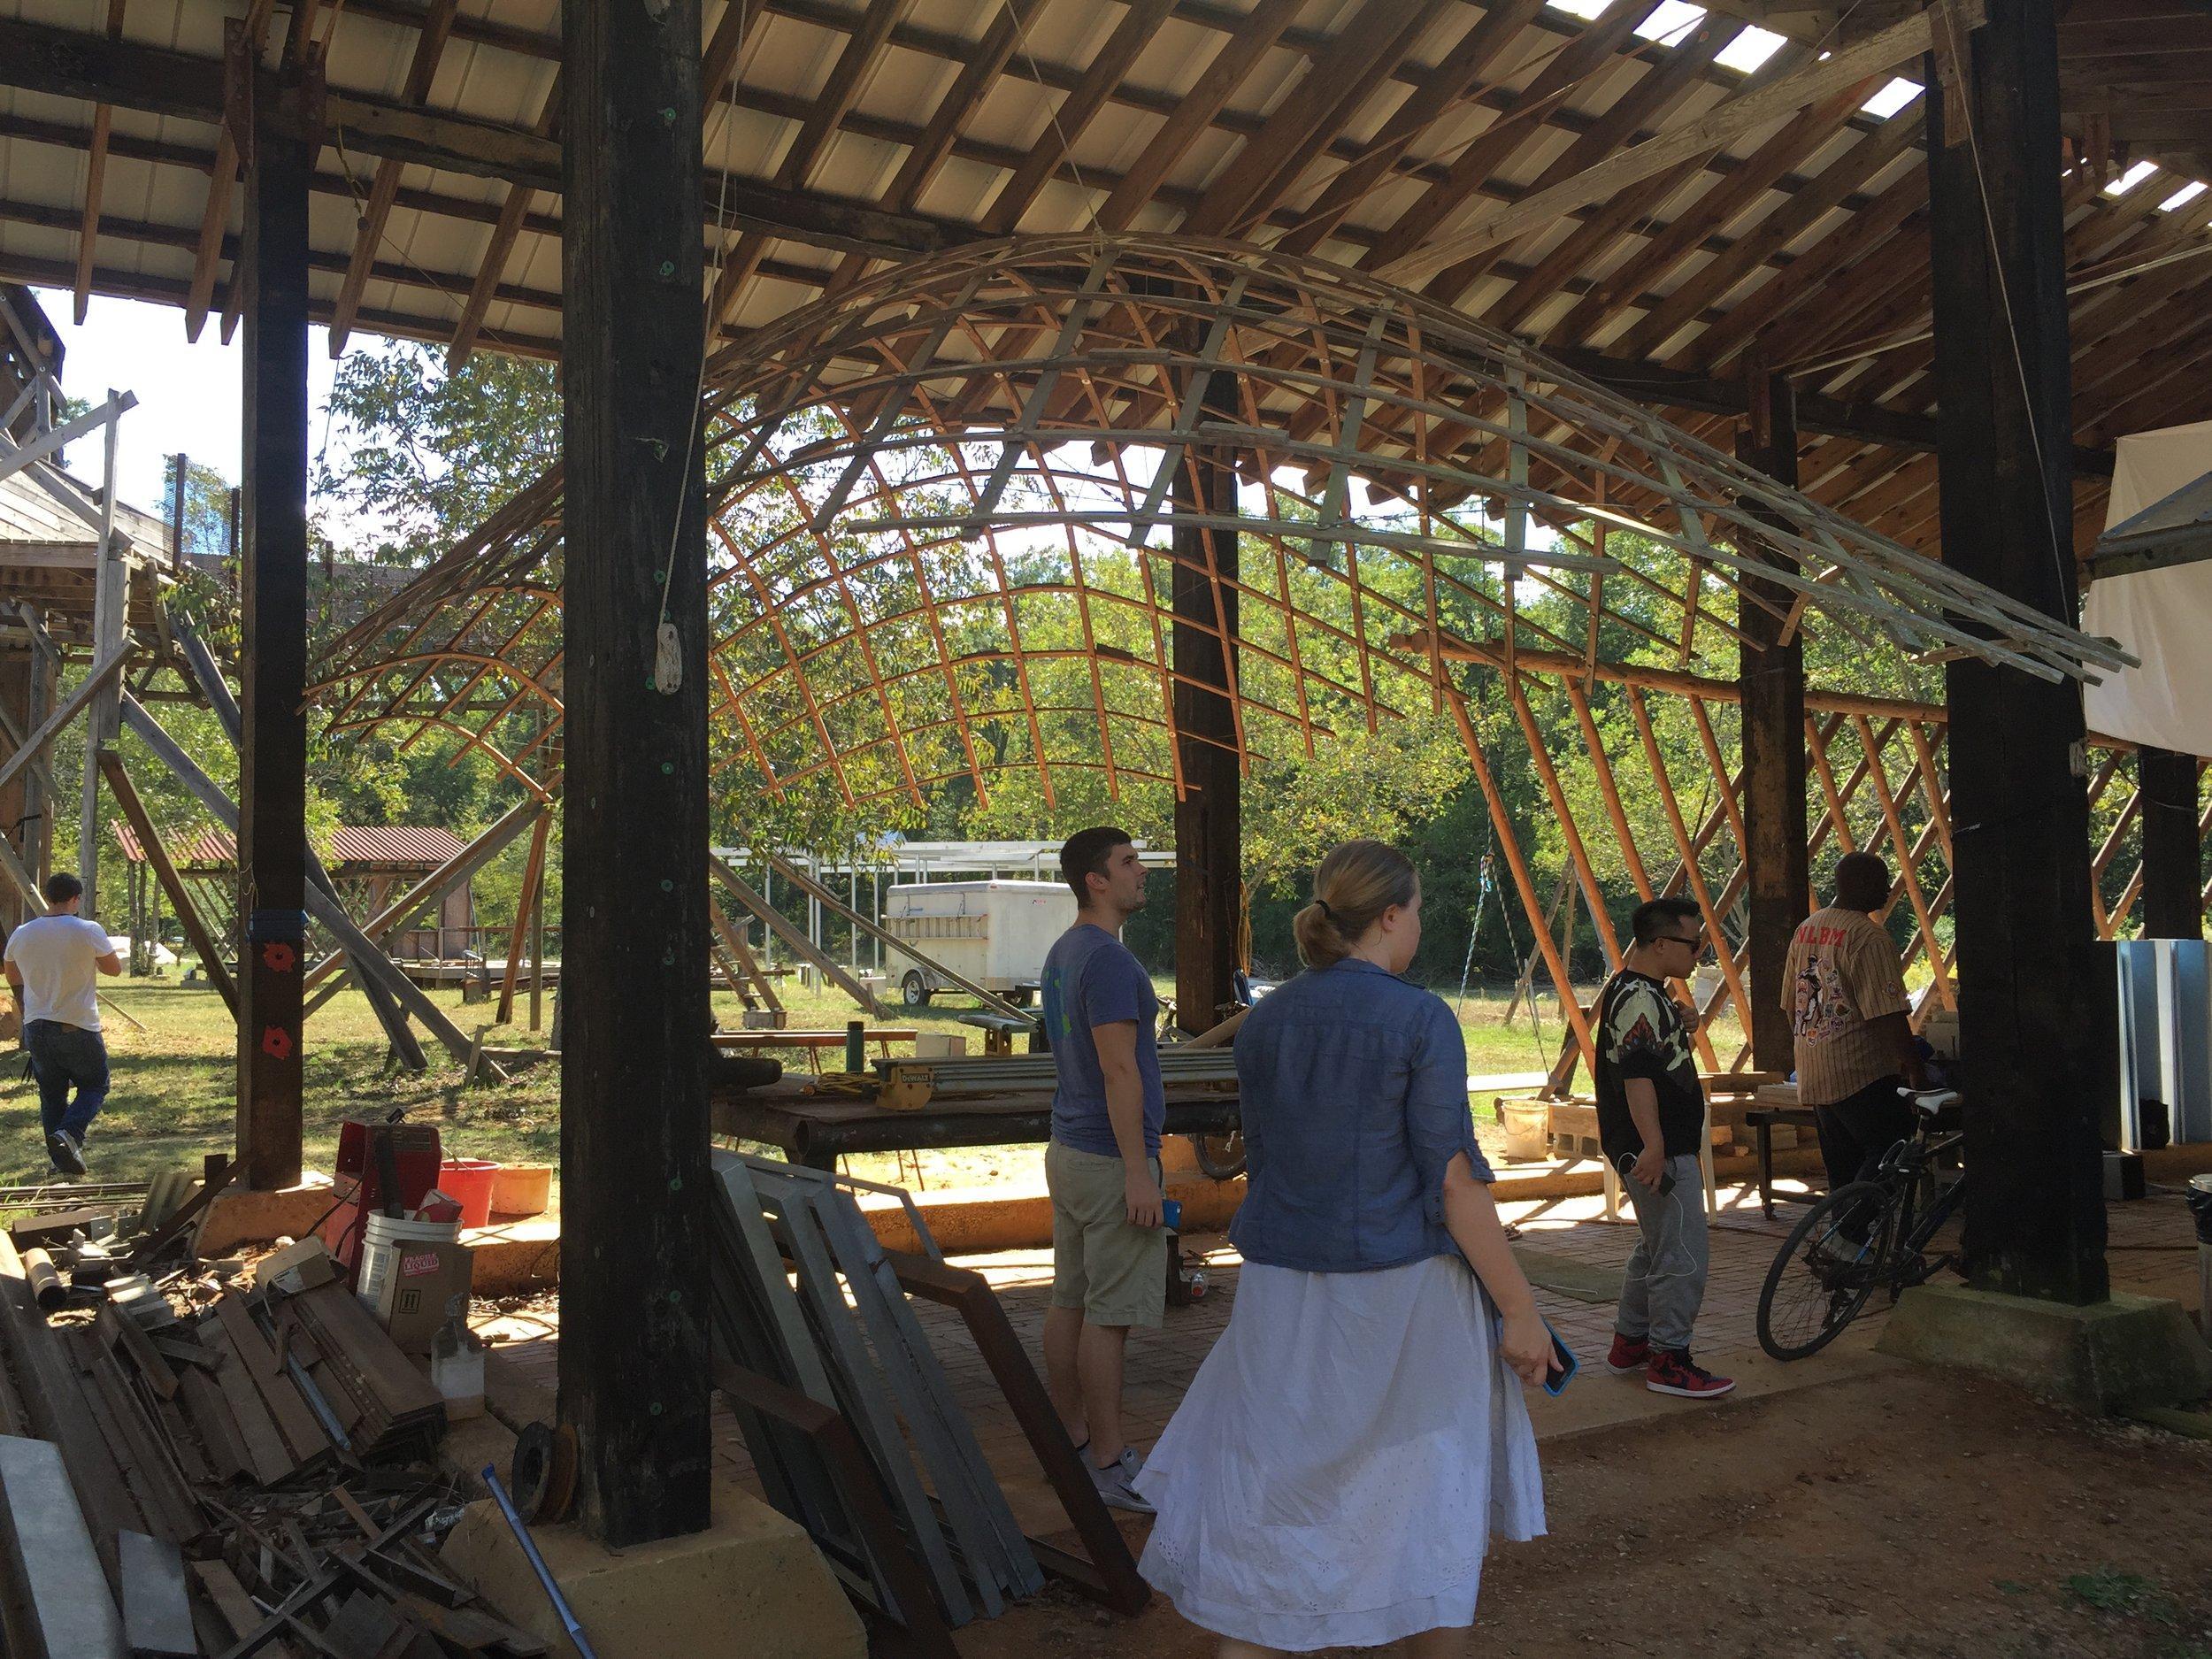 ARCH594-2015-Keddy-Rural Studio_3.JPG